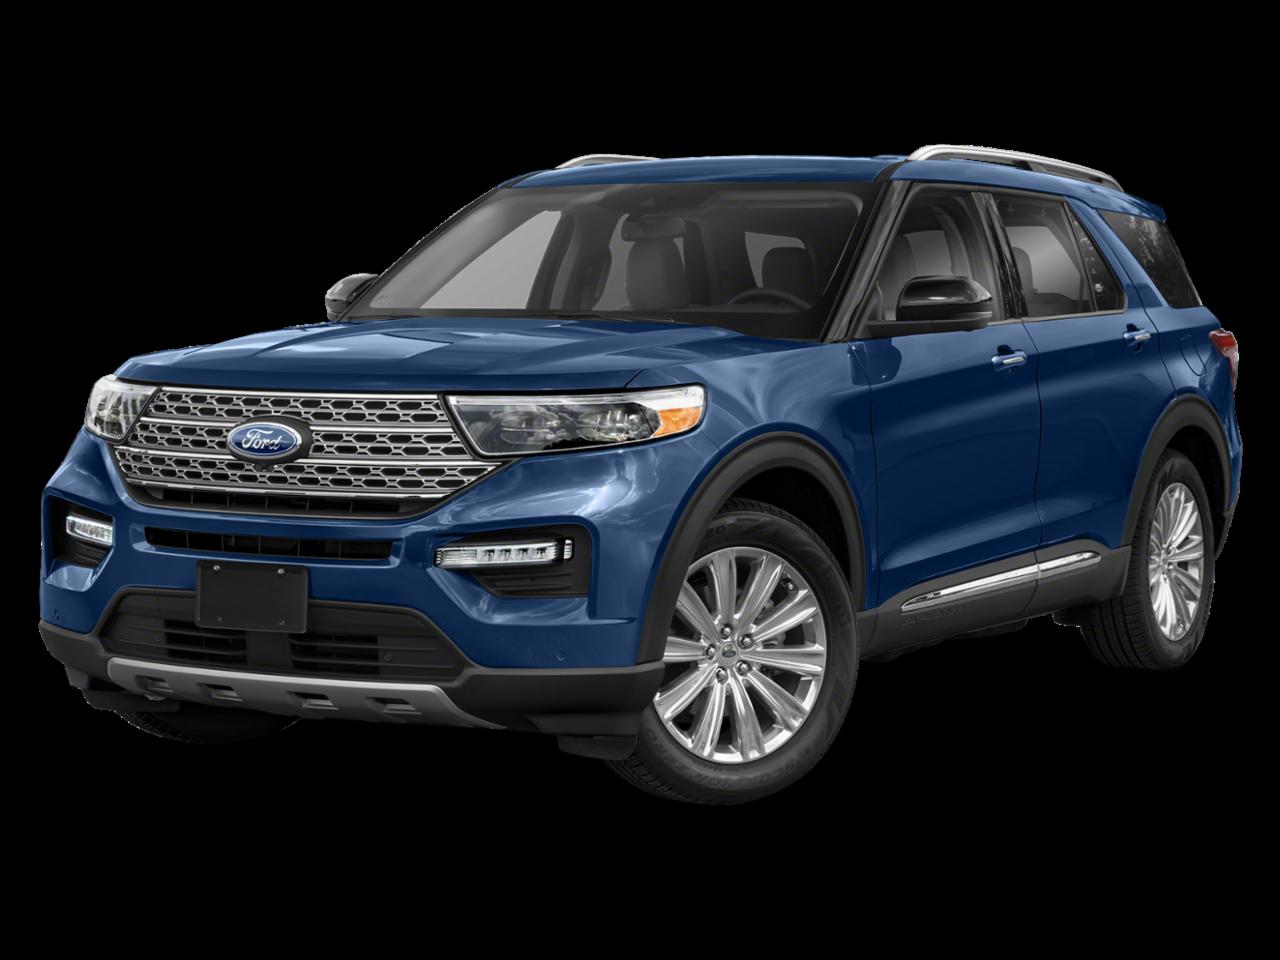 Ford 2020 Explorer Limited